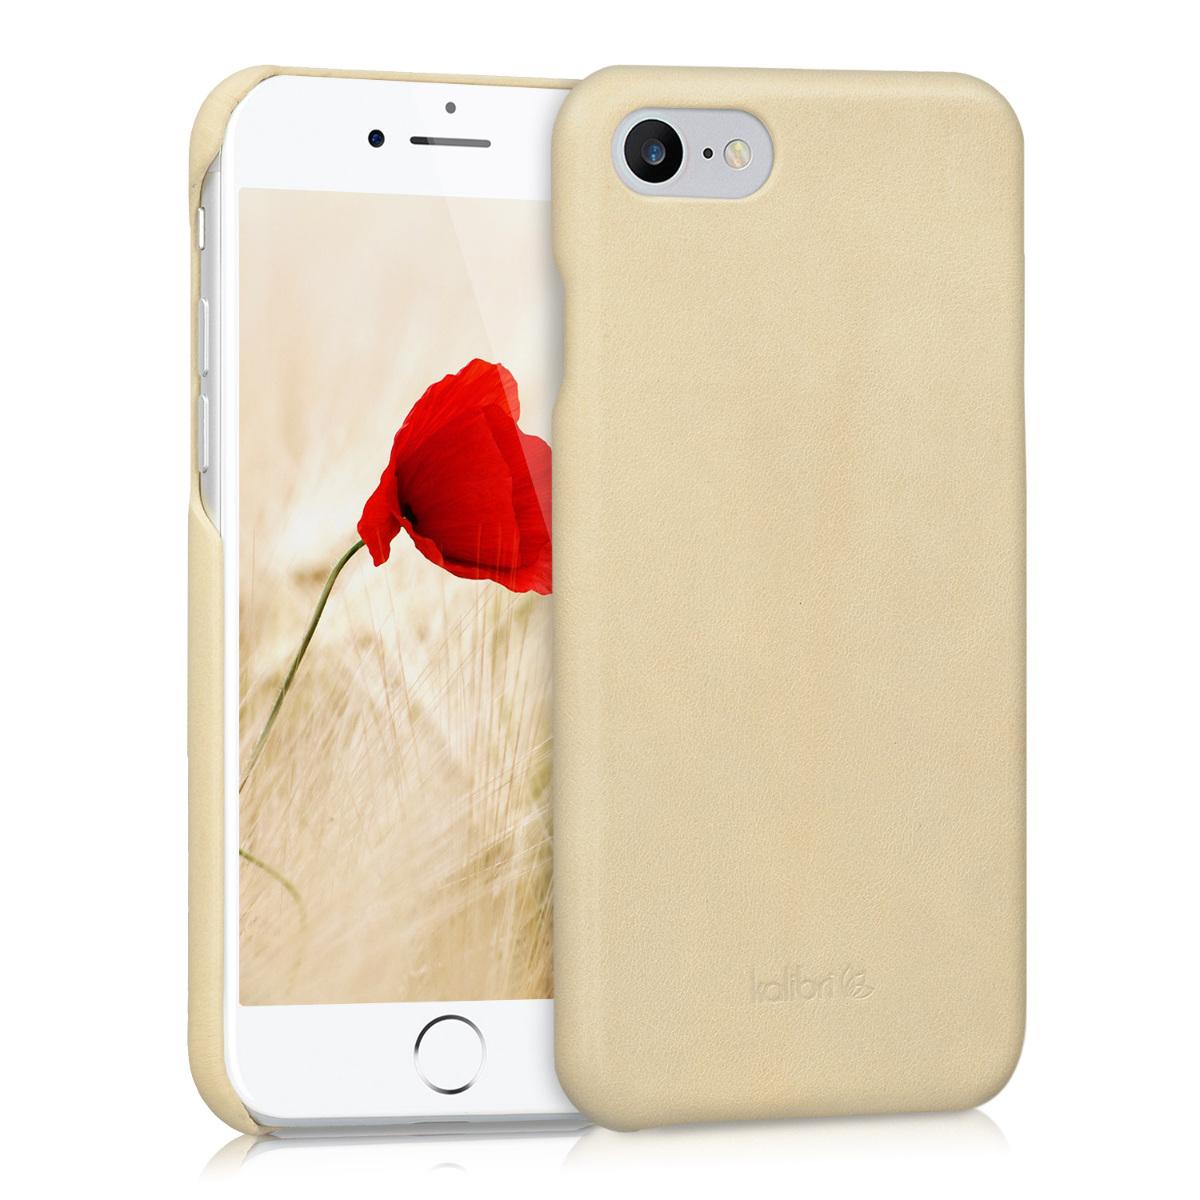 Kalibri Σκληρή Δερμάτινη Θήκη iPhone 7 / 8 - Beige (39345.11)